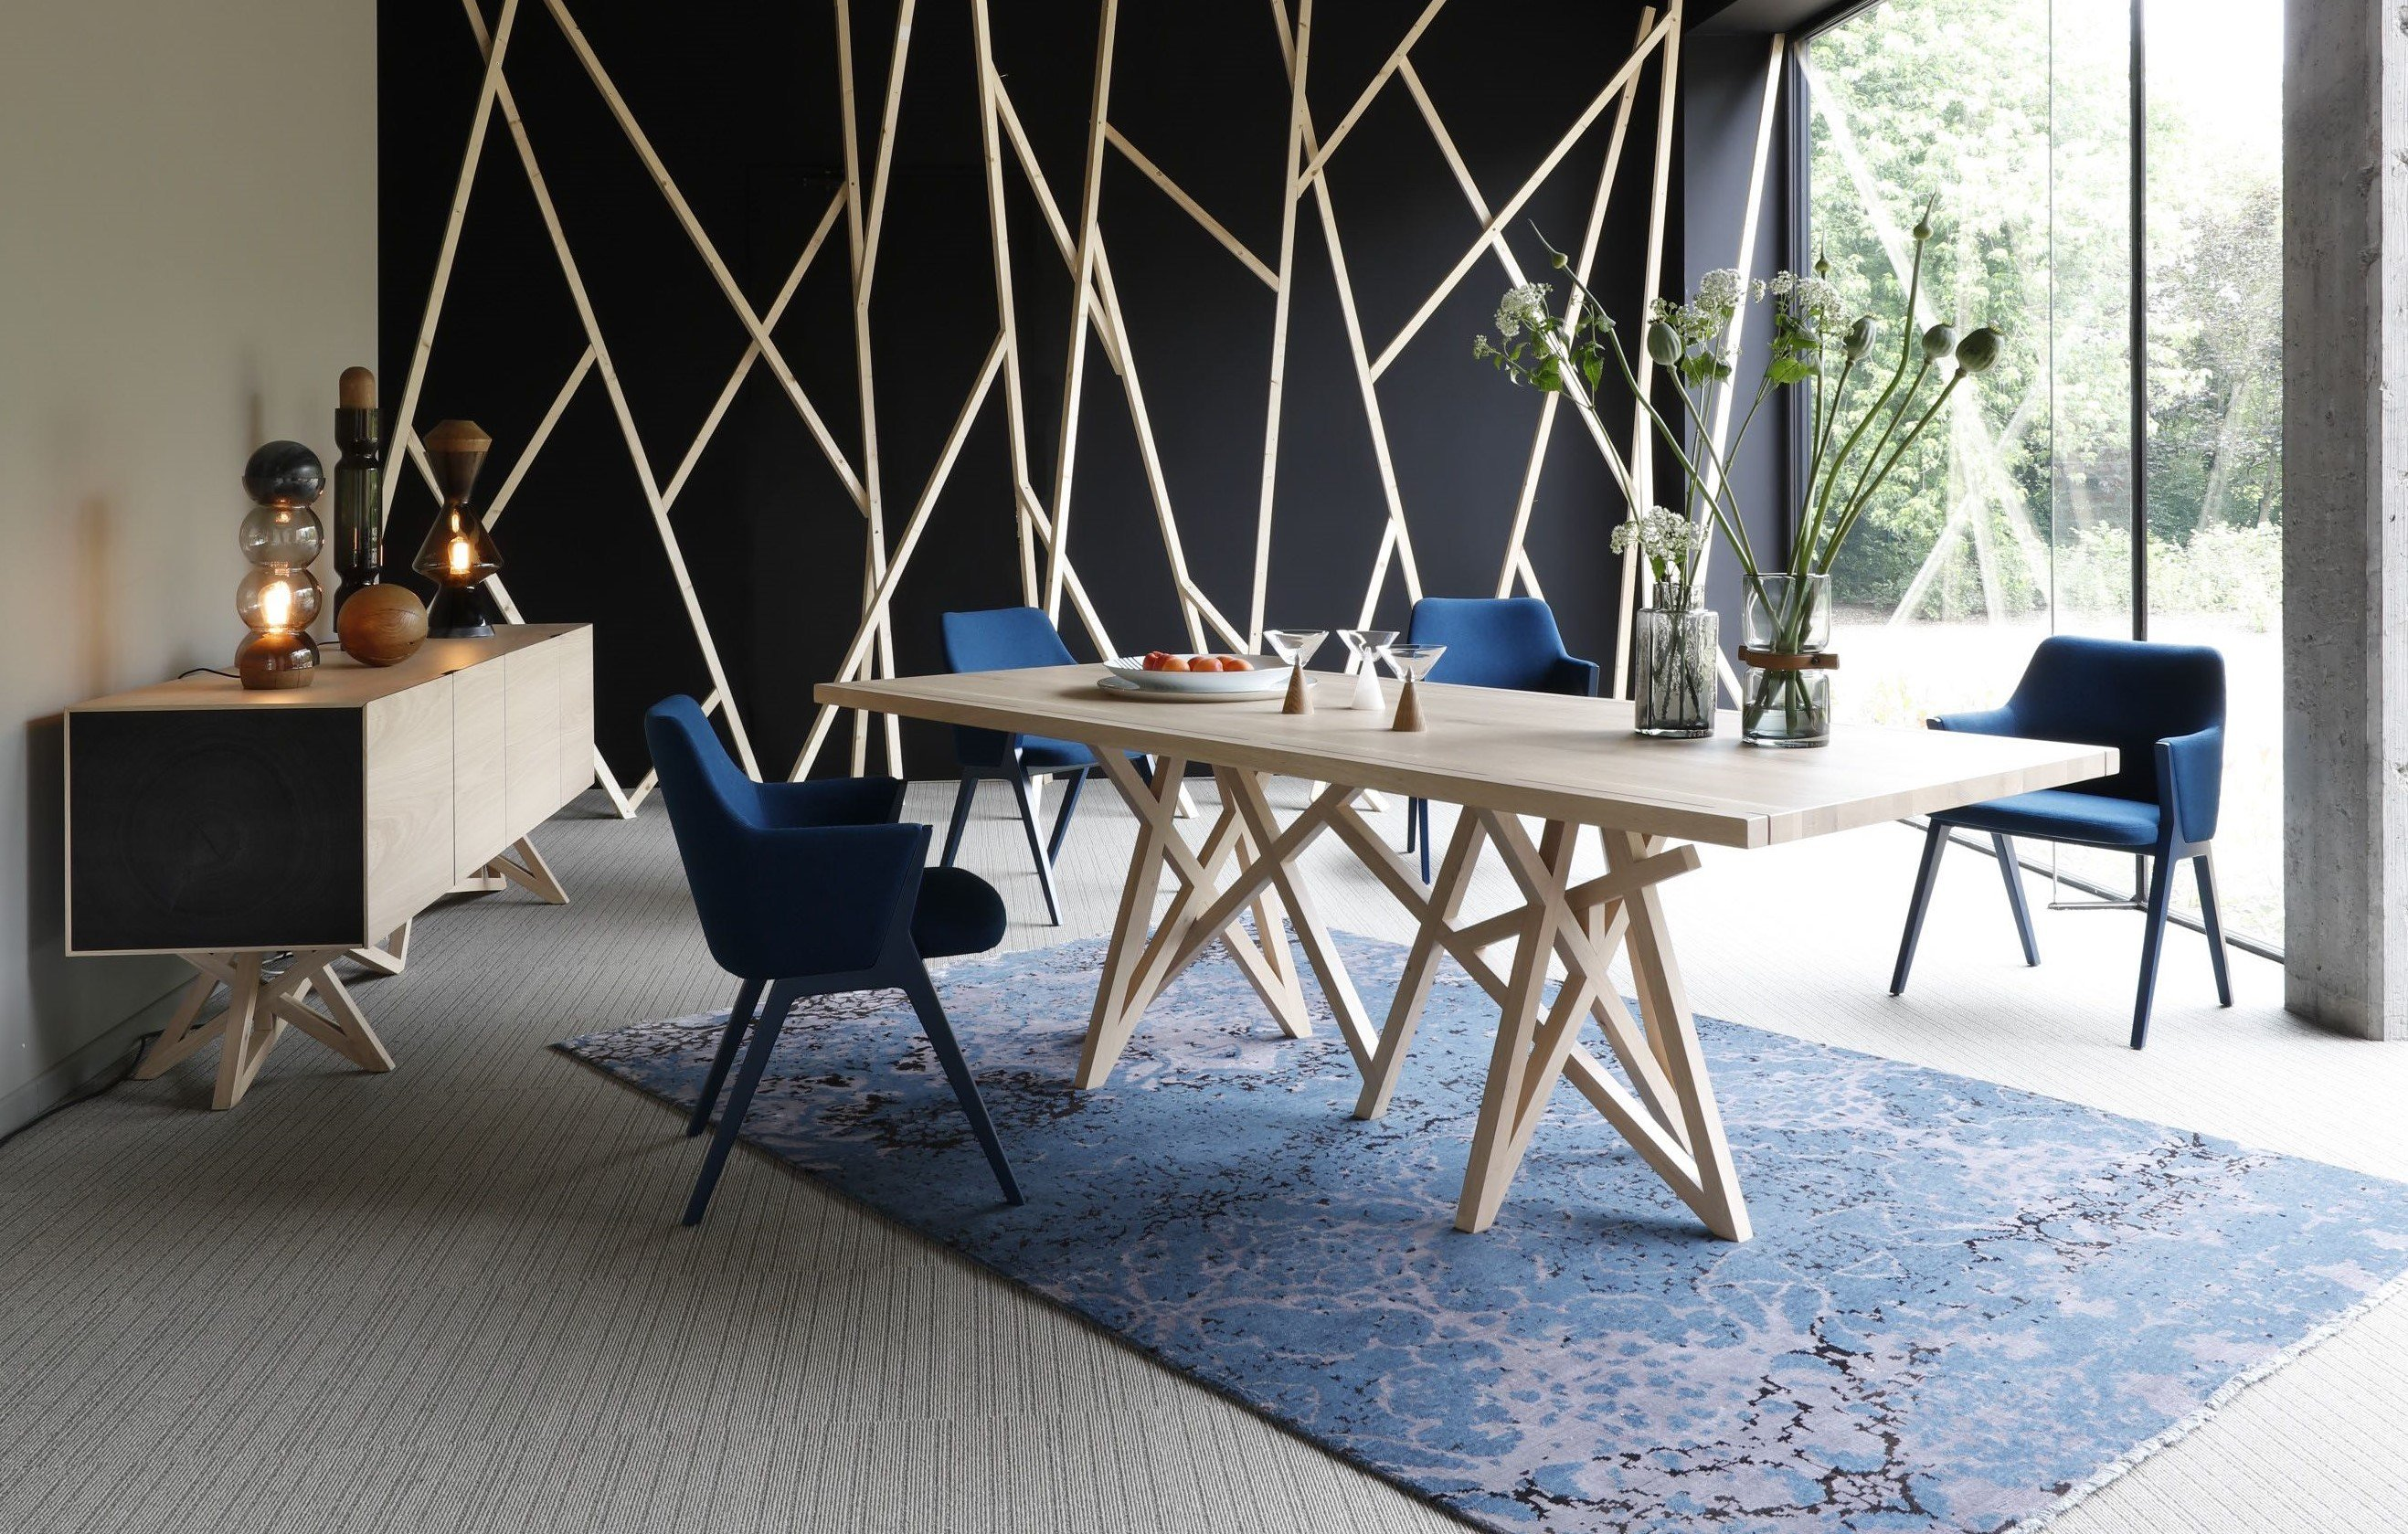 saga table collection saga by roche bobois design. Black Bedroom Furniture Sets. Home Design Ideas